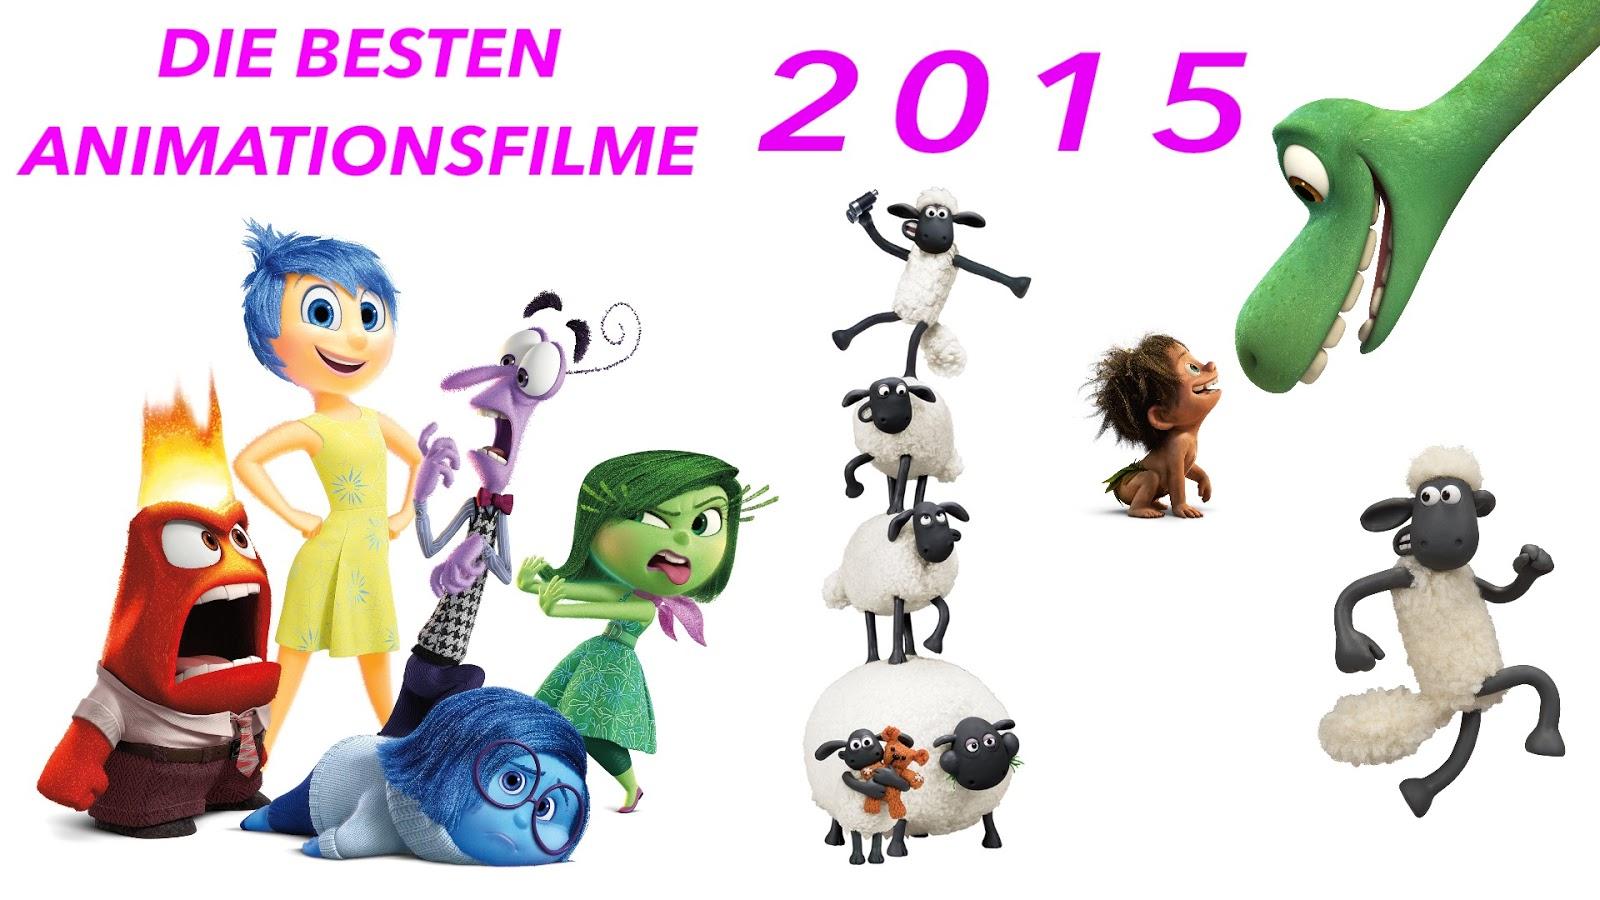 Animation Filme